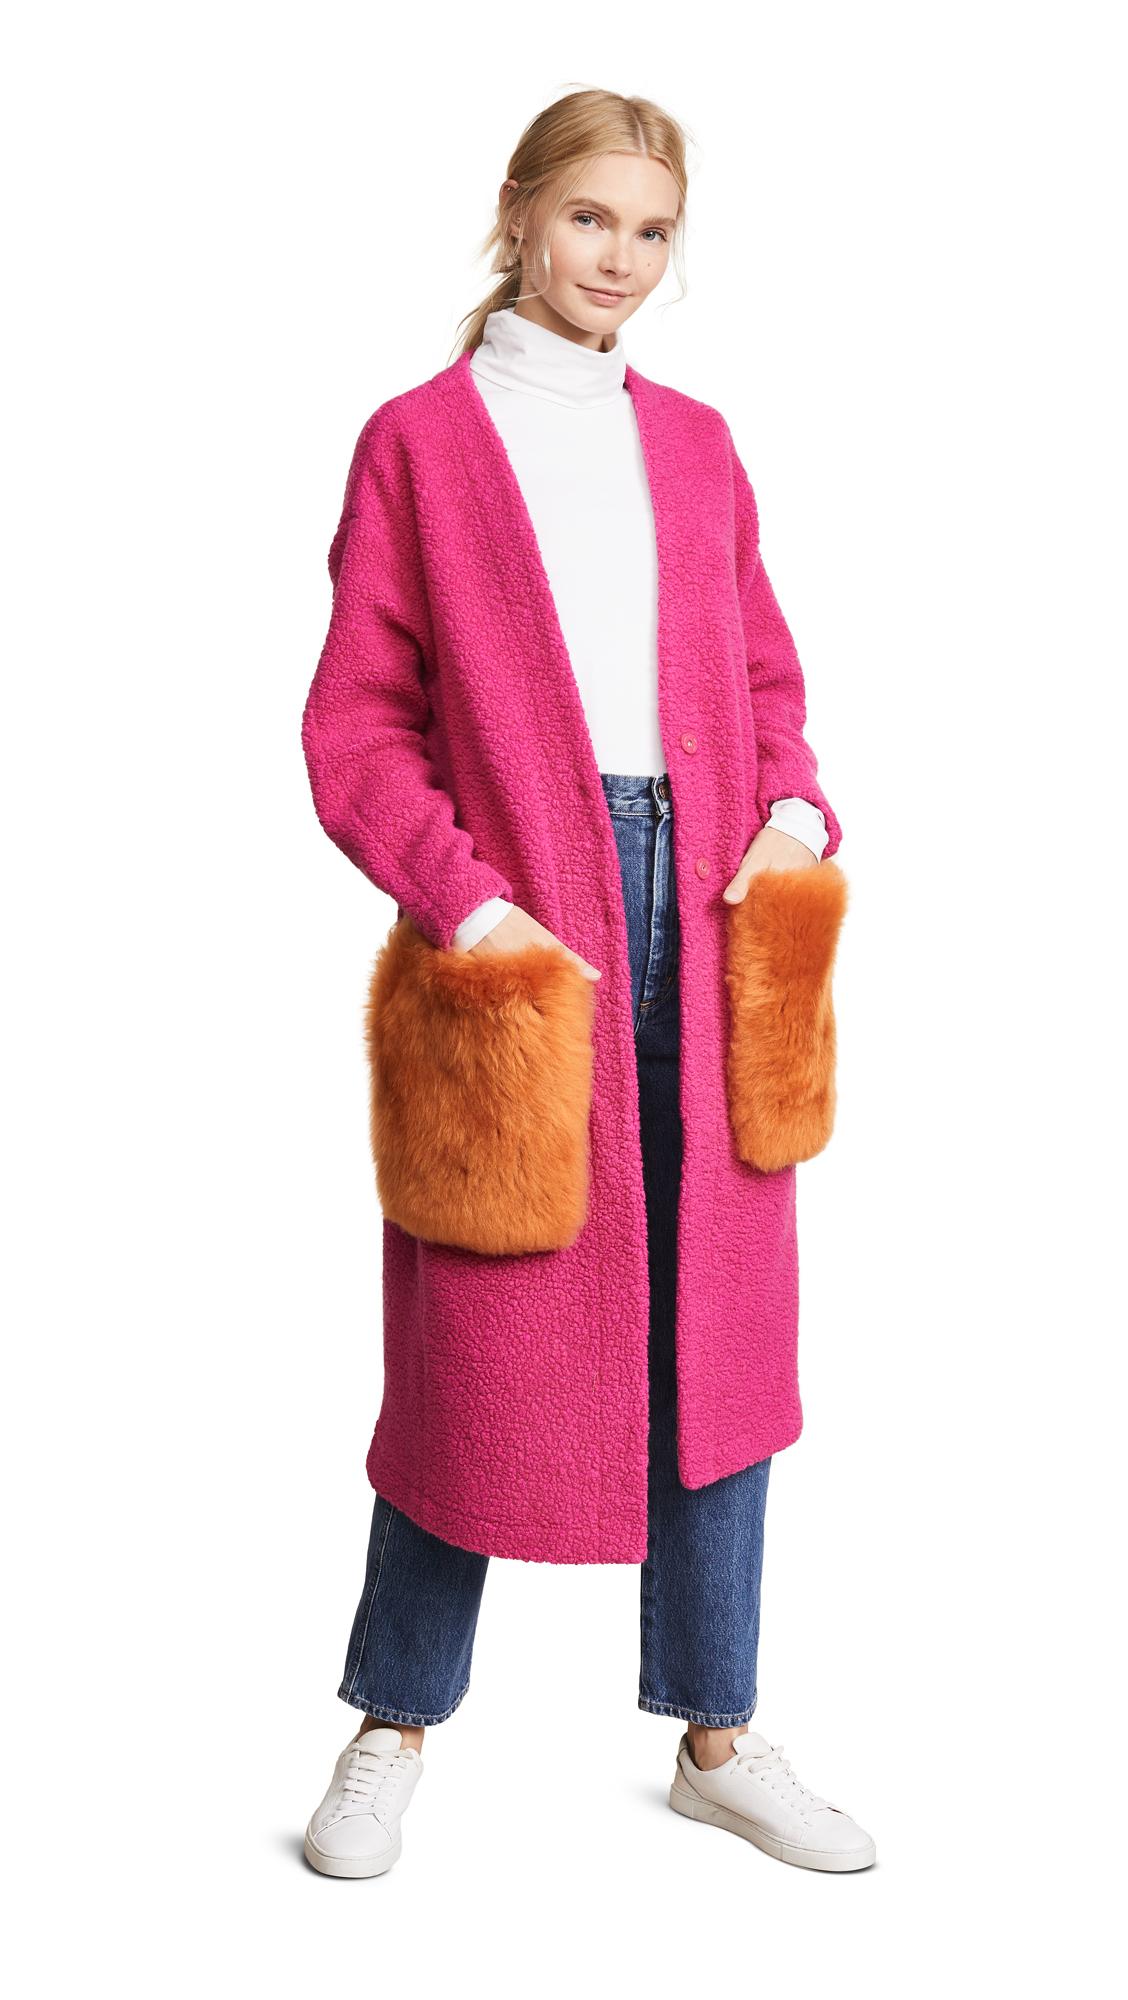 ANNE VEST May Cardigan in Pink/Orange